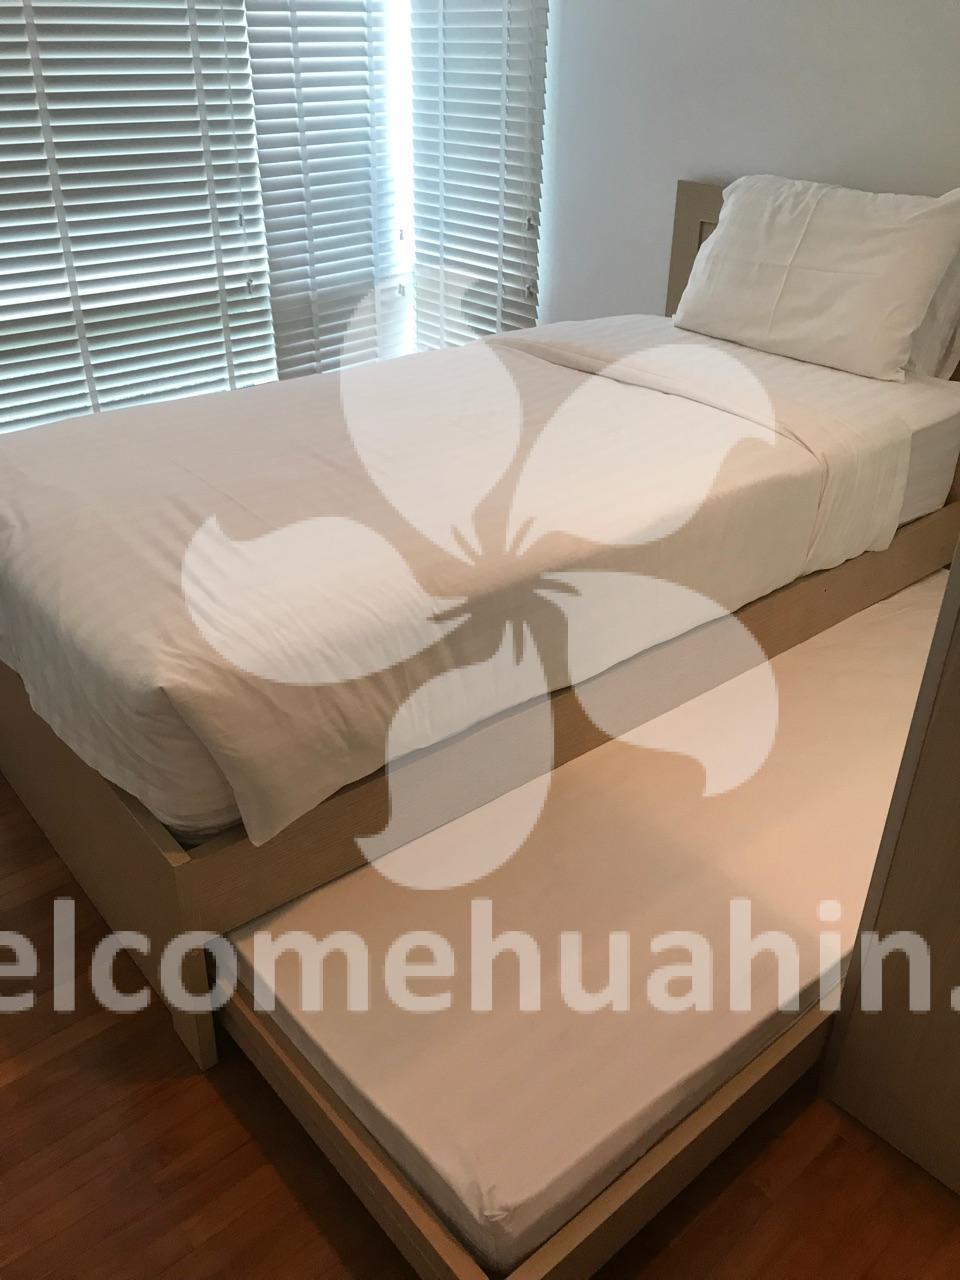 All Real Estate Hua Hin  Thailand